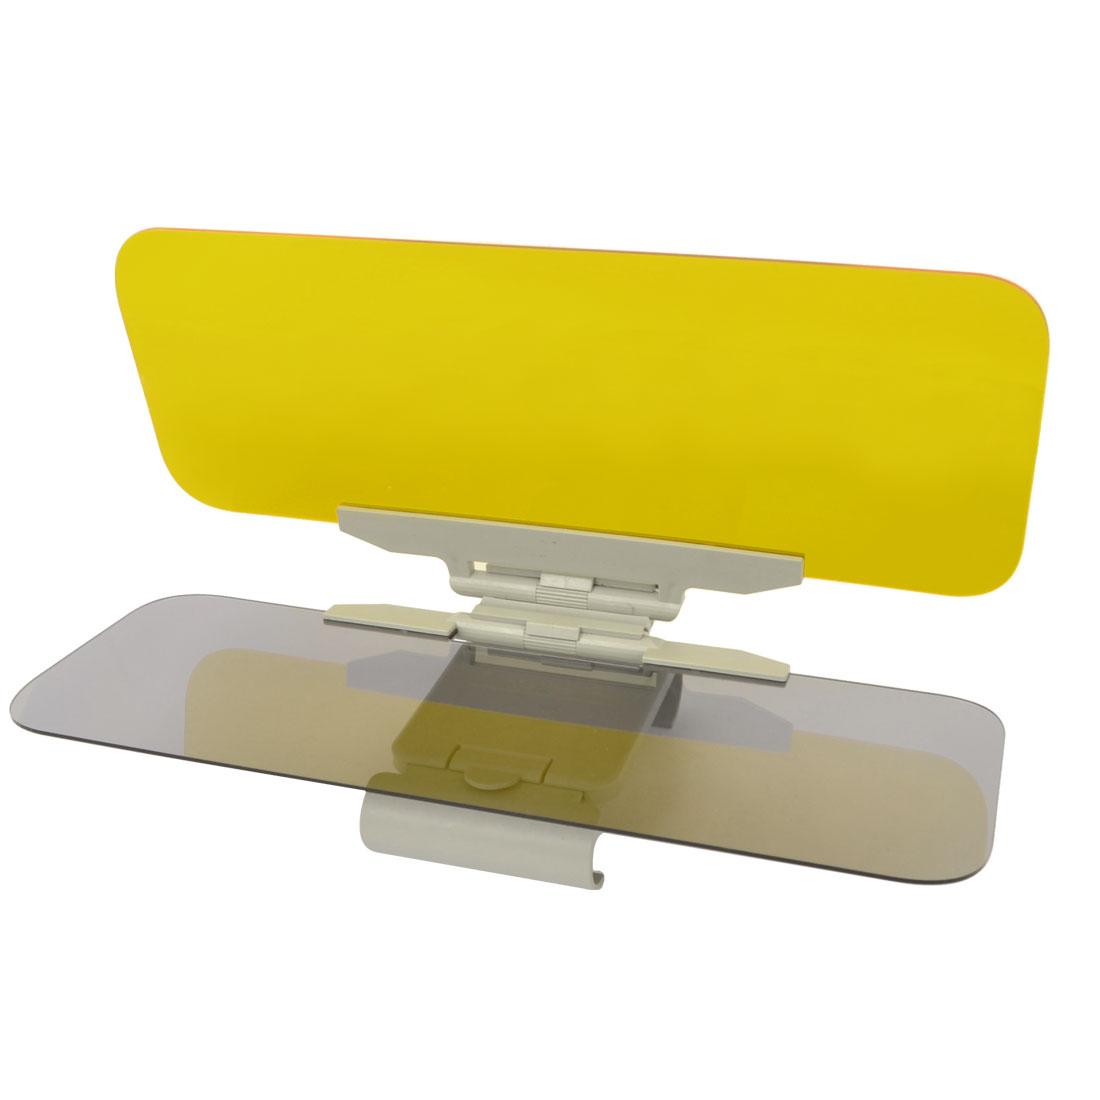 31.5cm x 11.5cm Two Way Plastic Generation Car Day Night Anti-glare Visor Brown